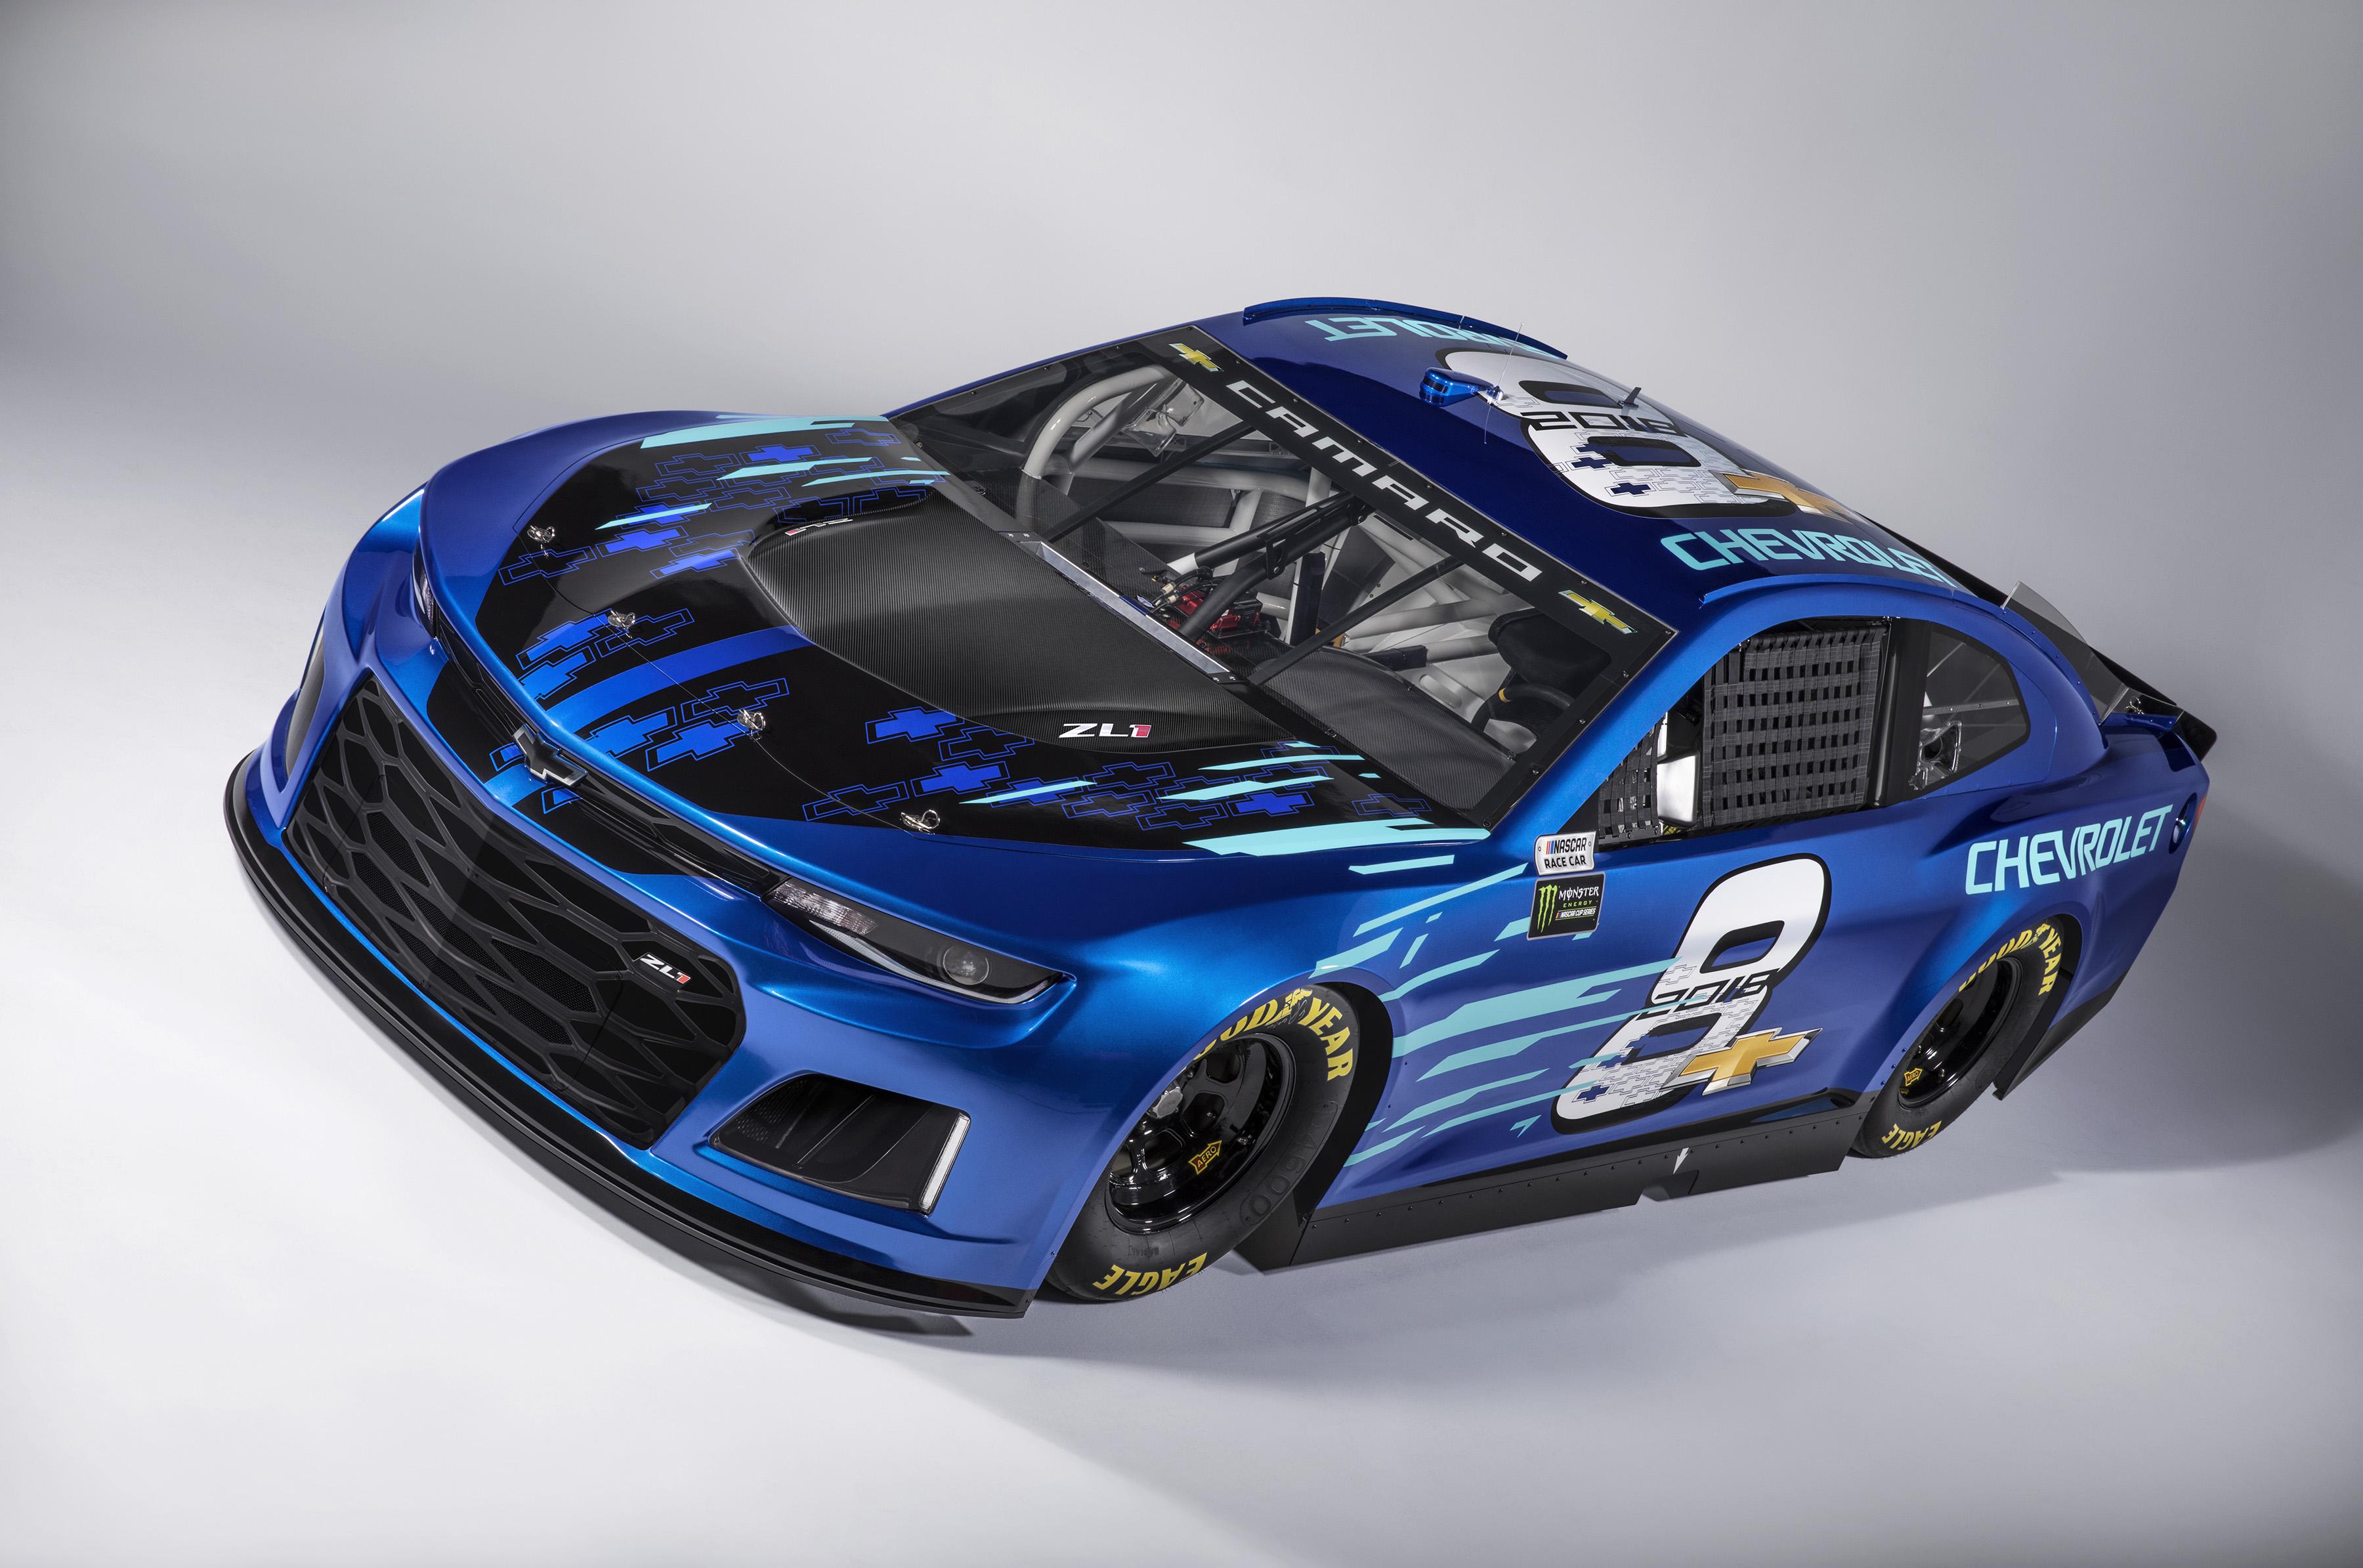 Chevrolet Reveals The 2018 Camaro Zl1 Nascar Cup Race Car The News Wheel